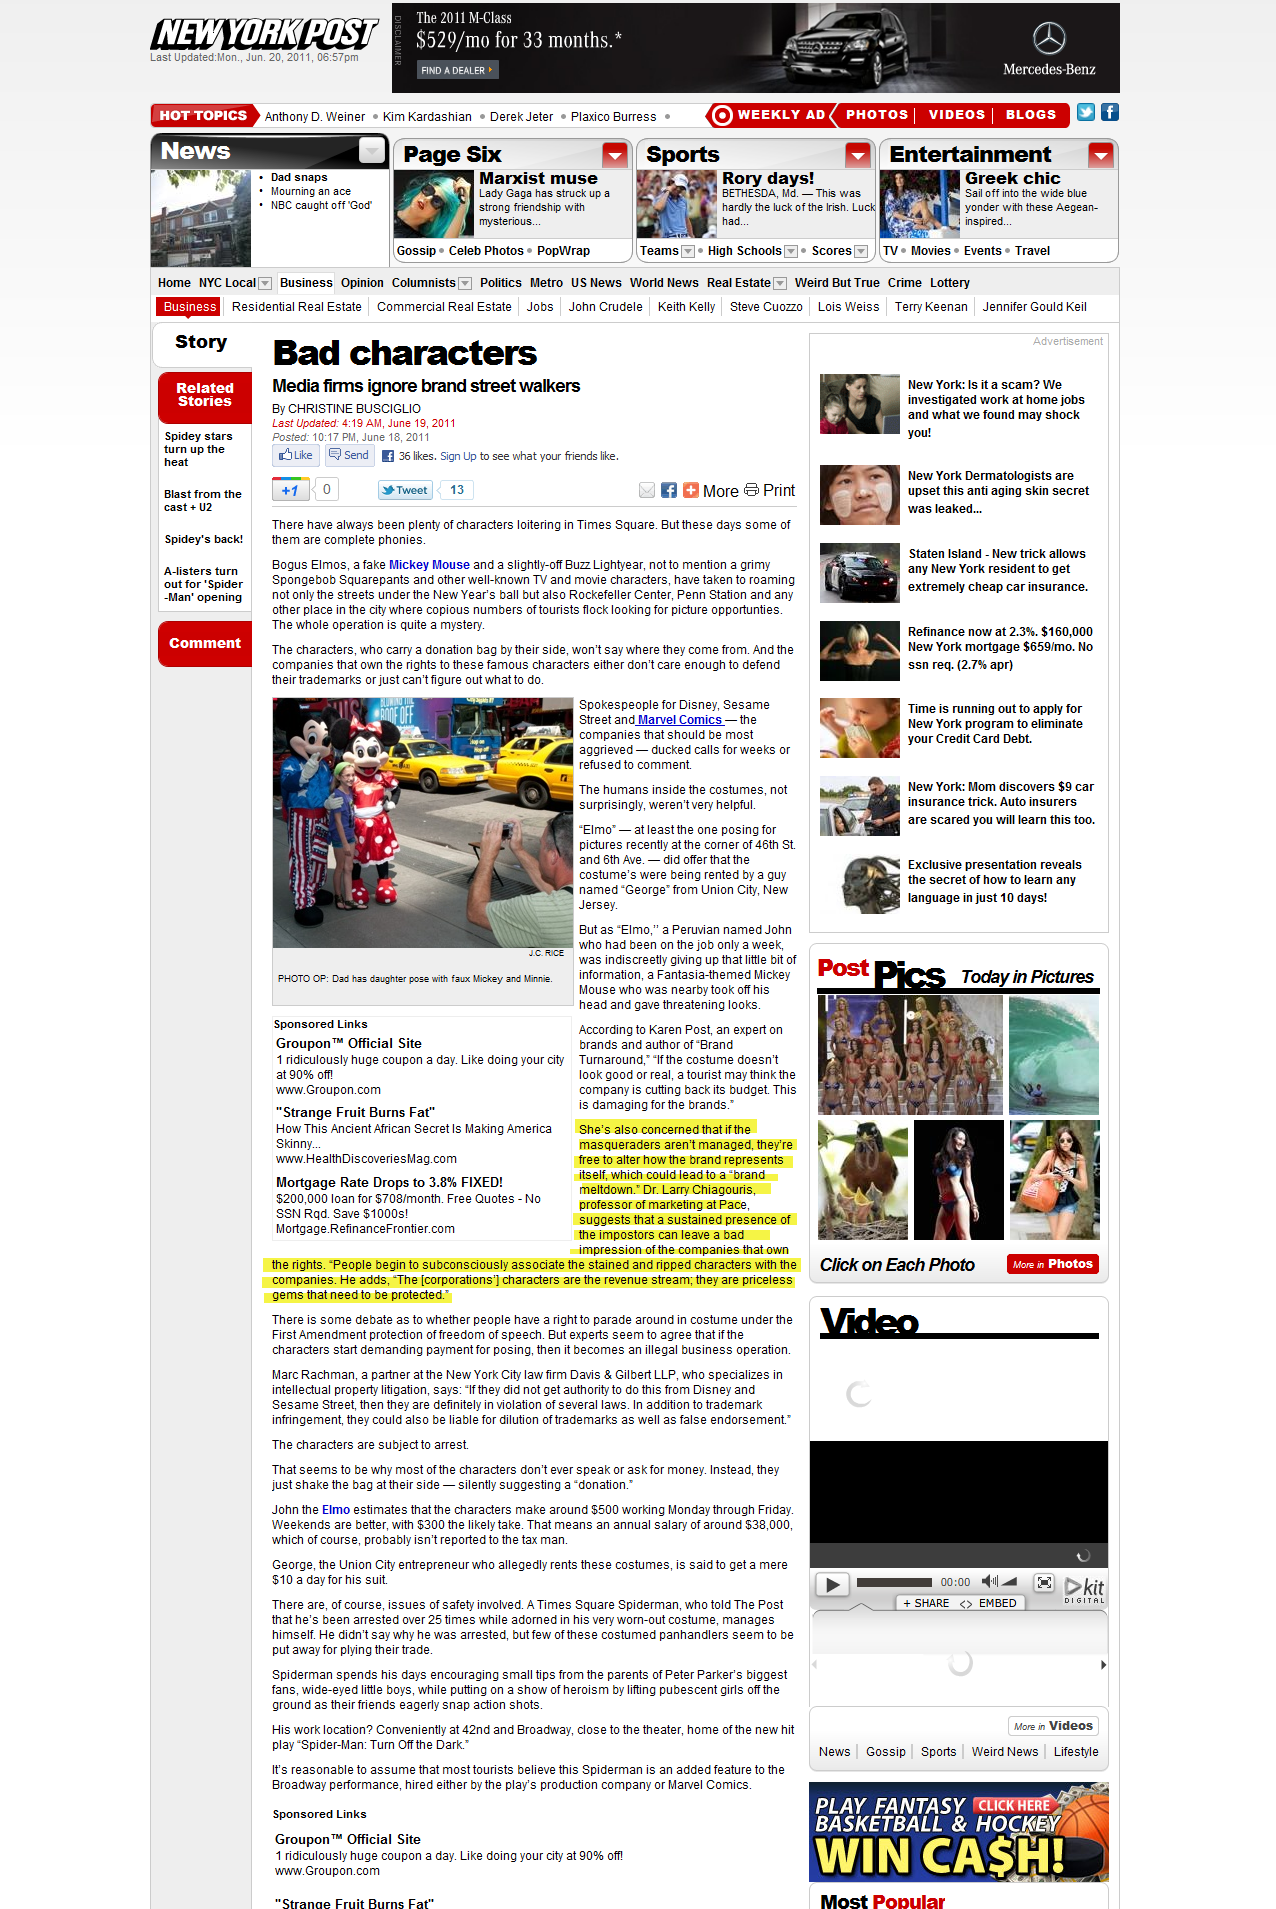 Bad Characters –New York Post